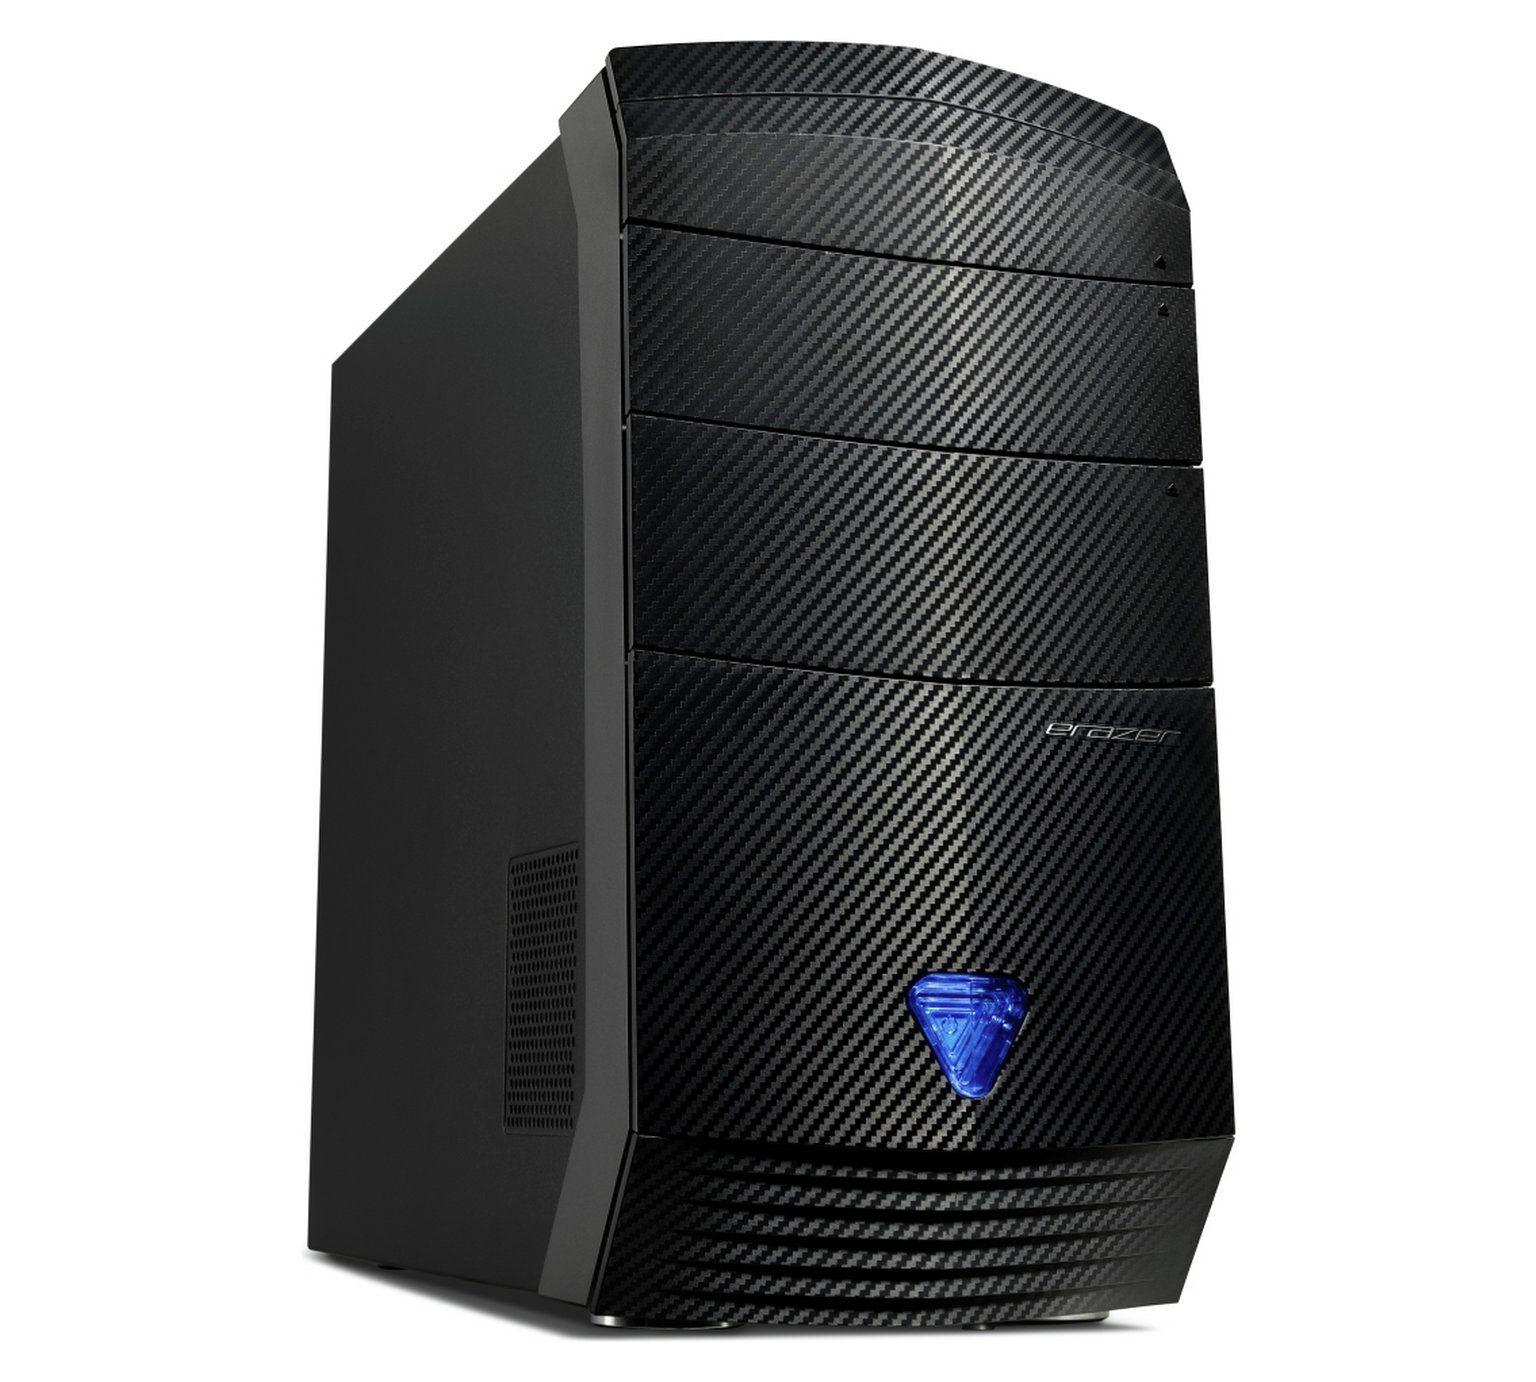 Medion Erazer i7 8GB 1TB GTX1050TI Gaming PC - £689.99 Free C&C @ Argos